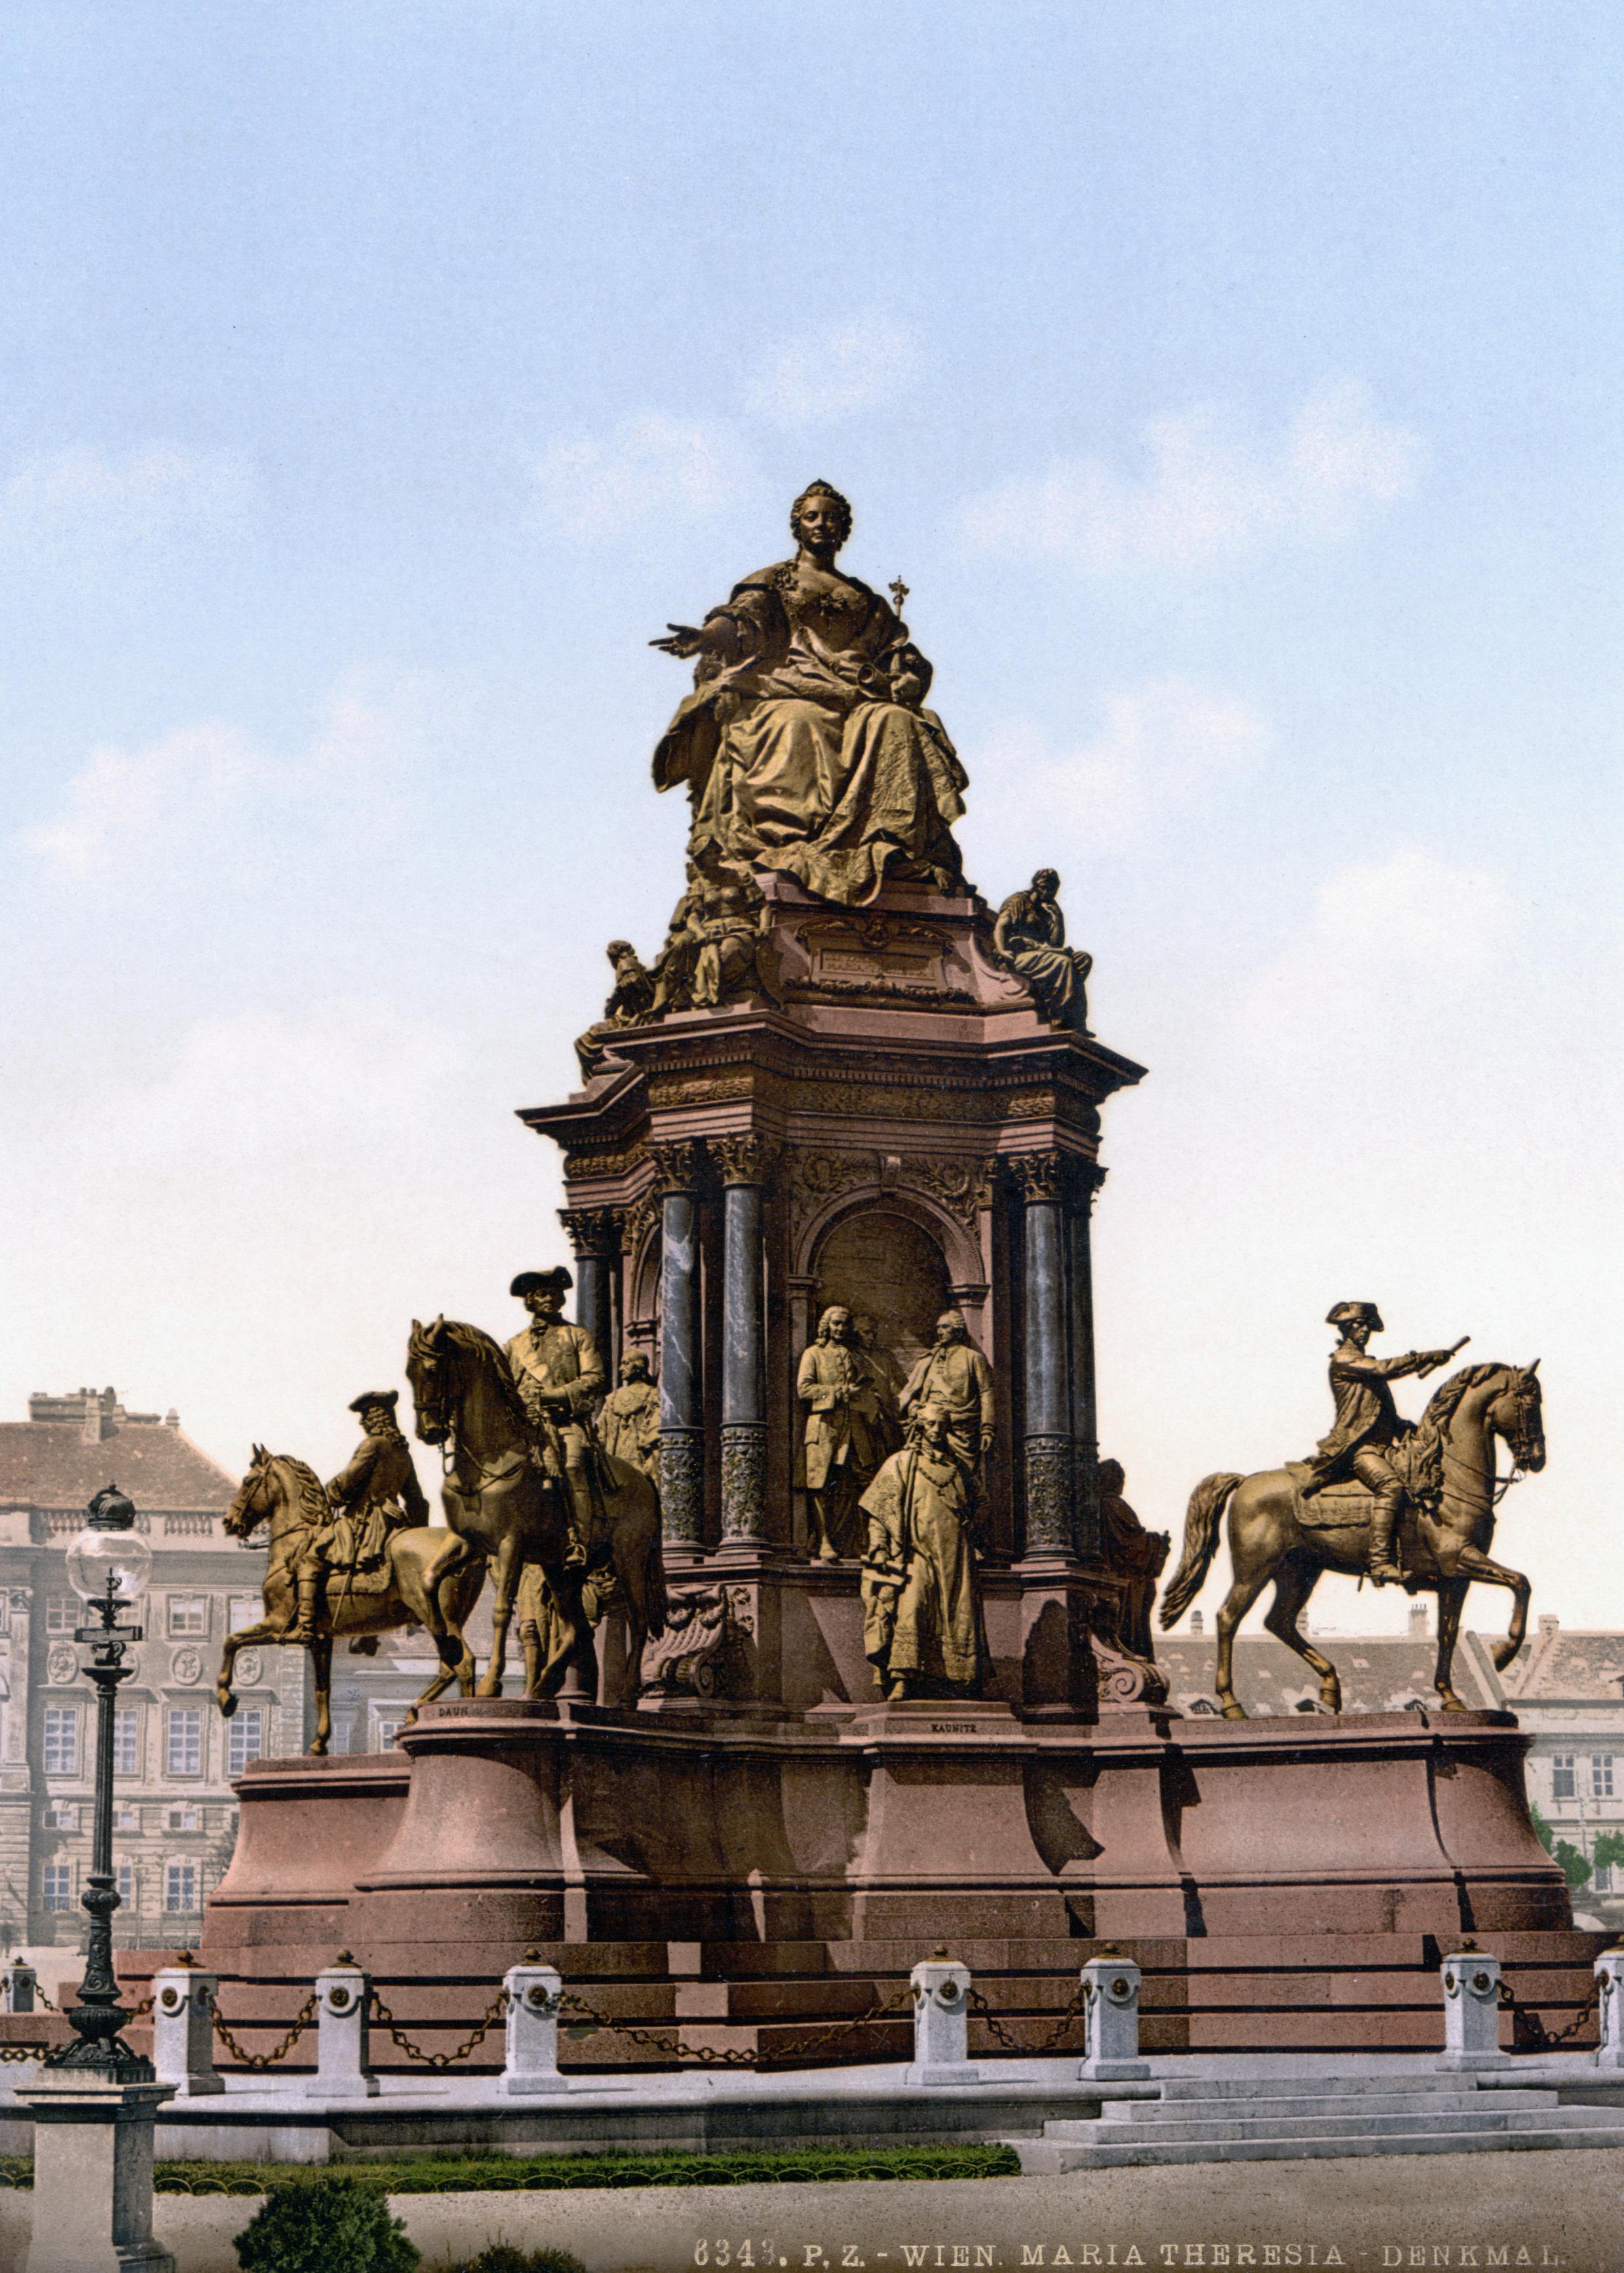 Maria-Theresia-Denkmal Wien 1900.jpg